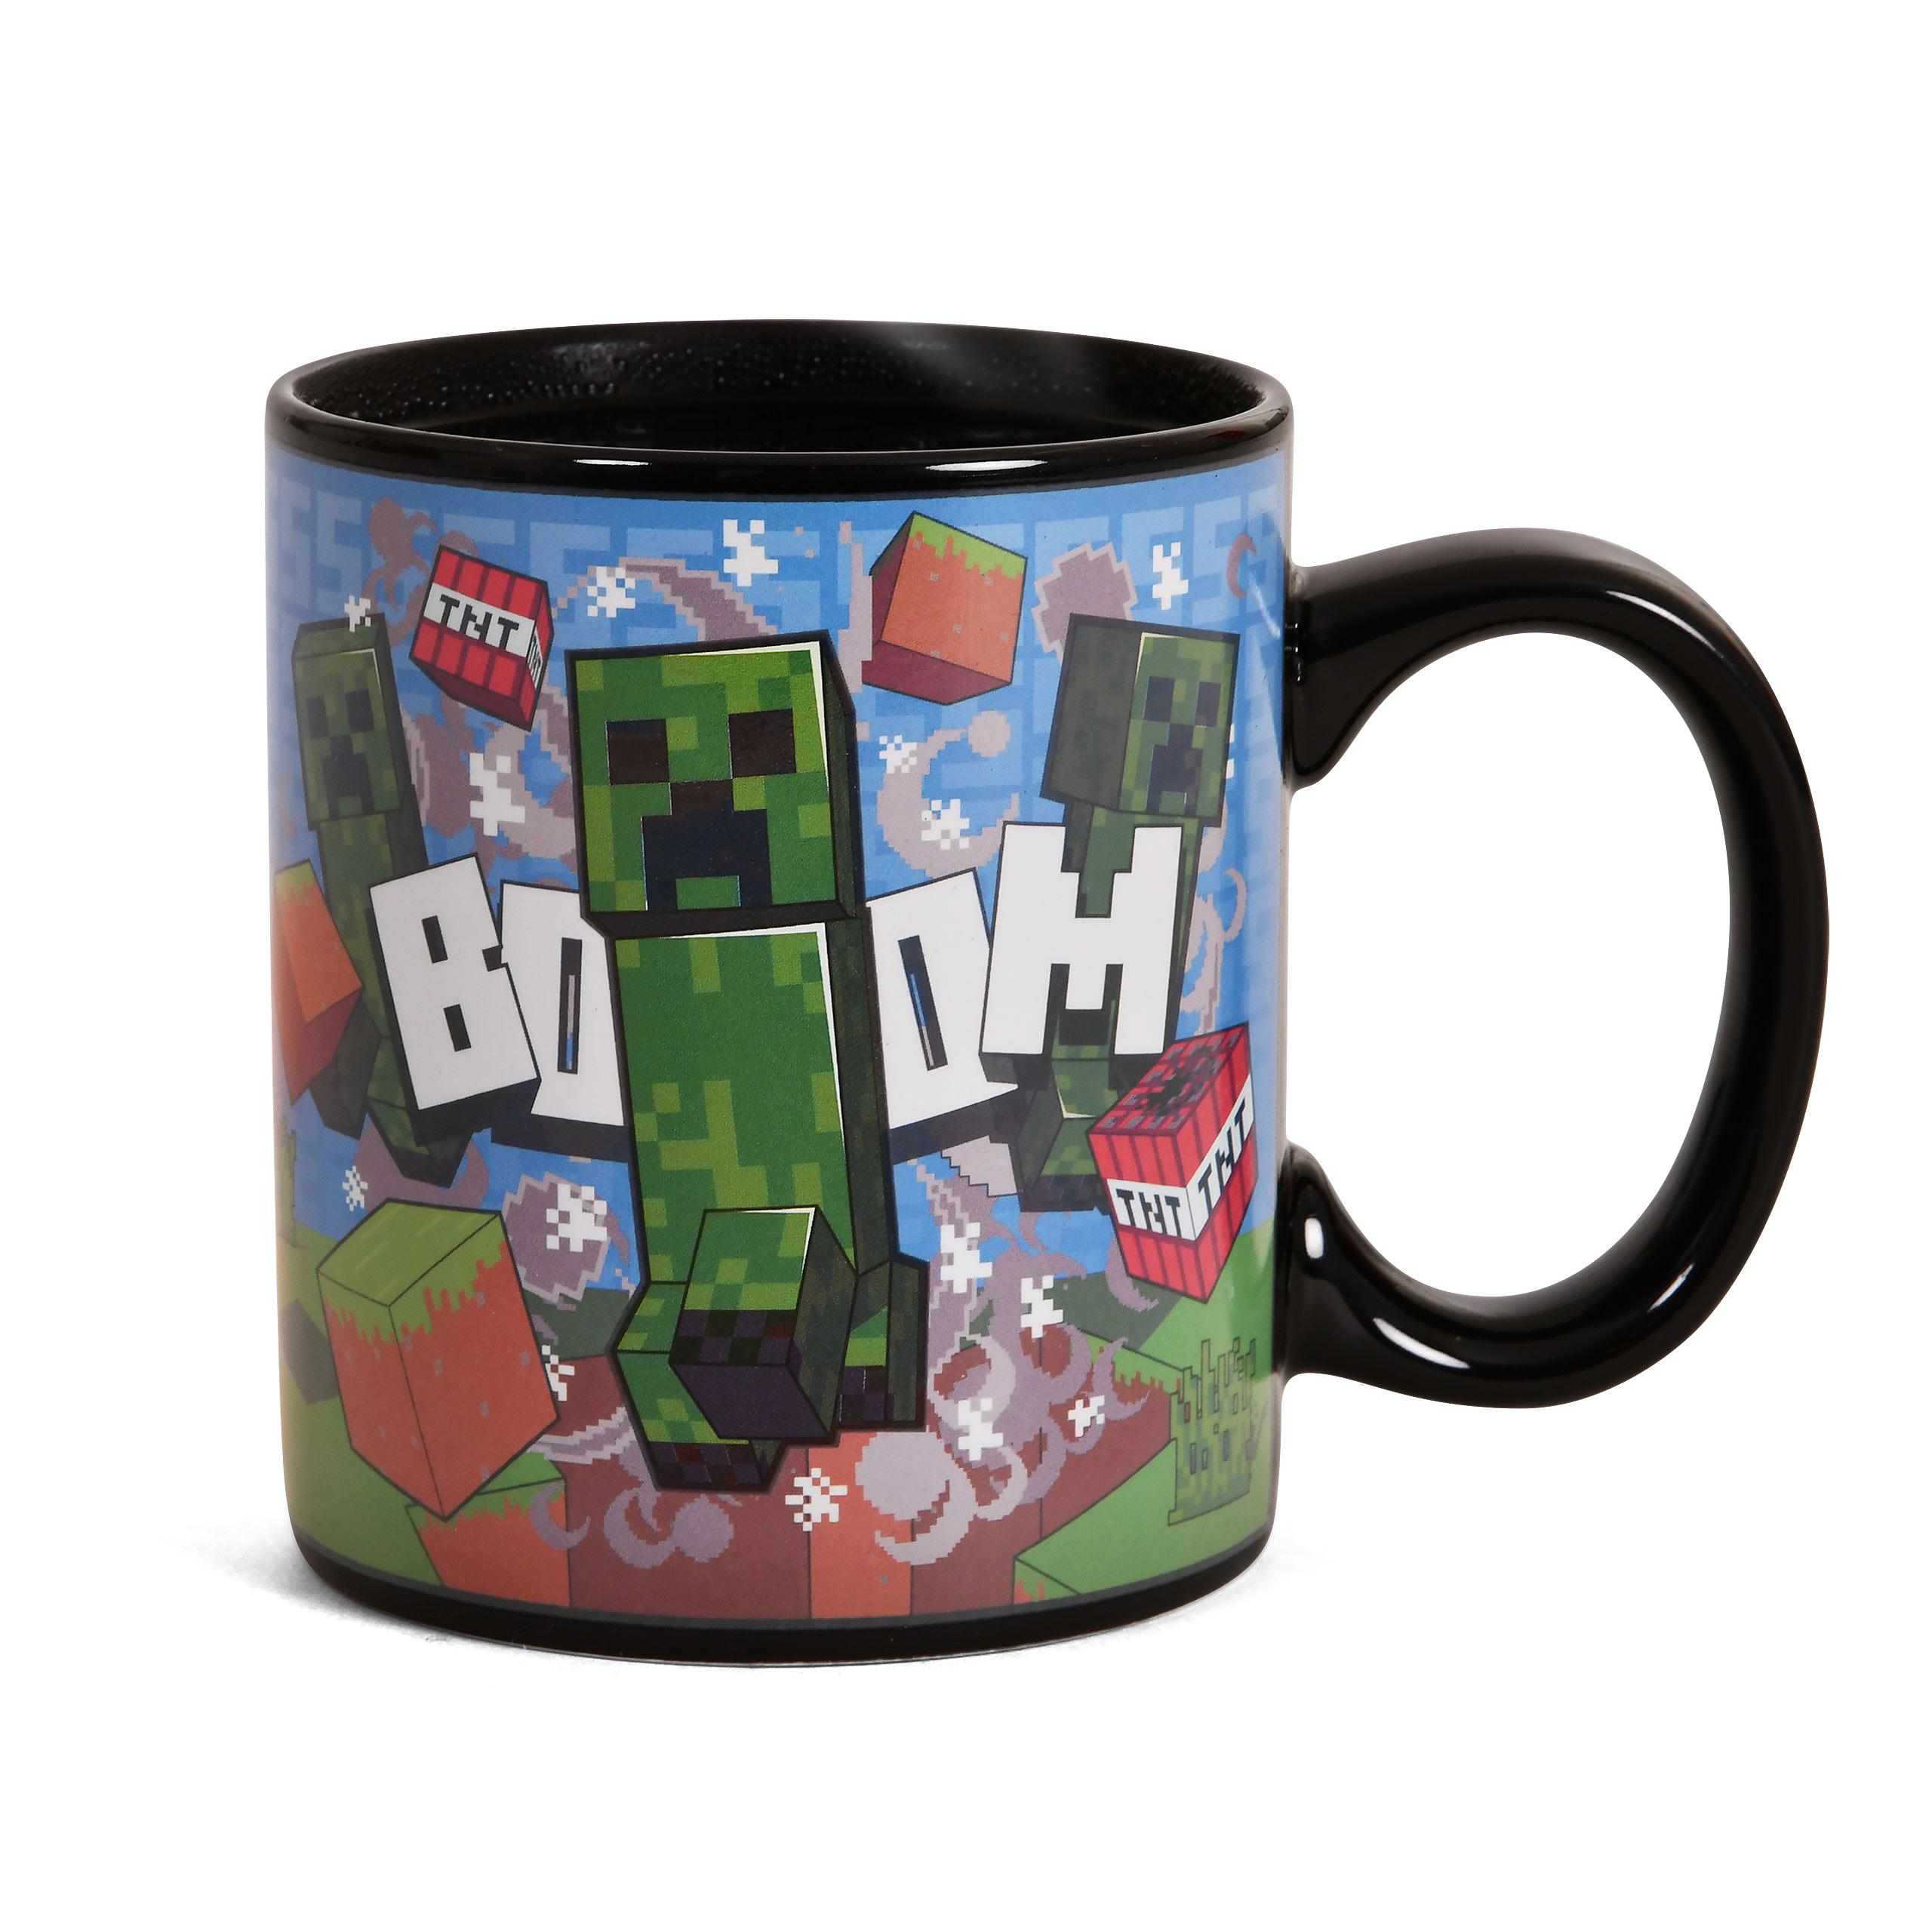 Minecraft - Creeper Thermoeffekt Tasse